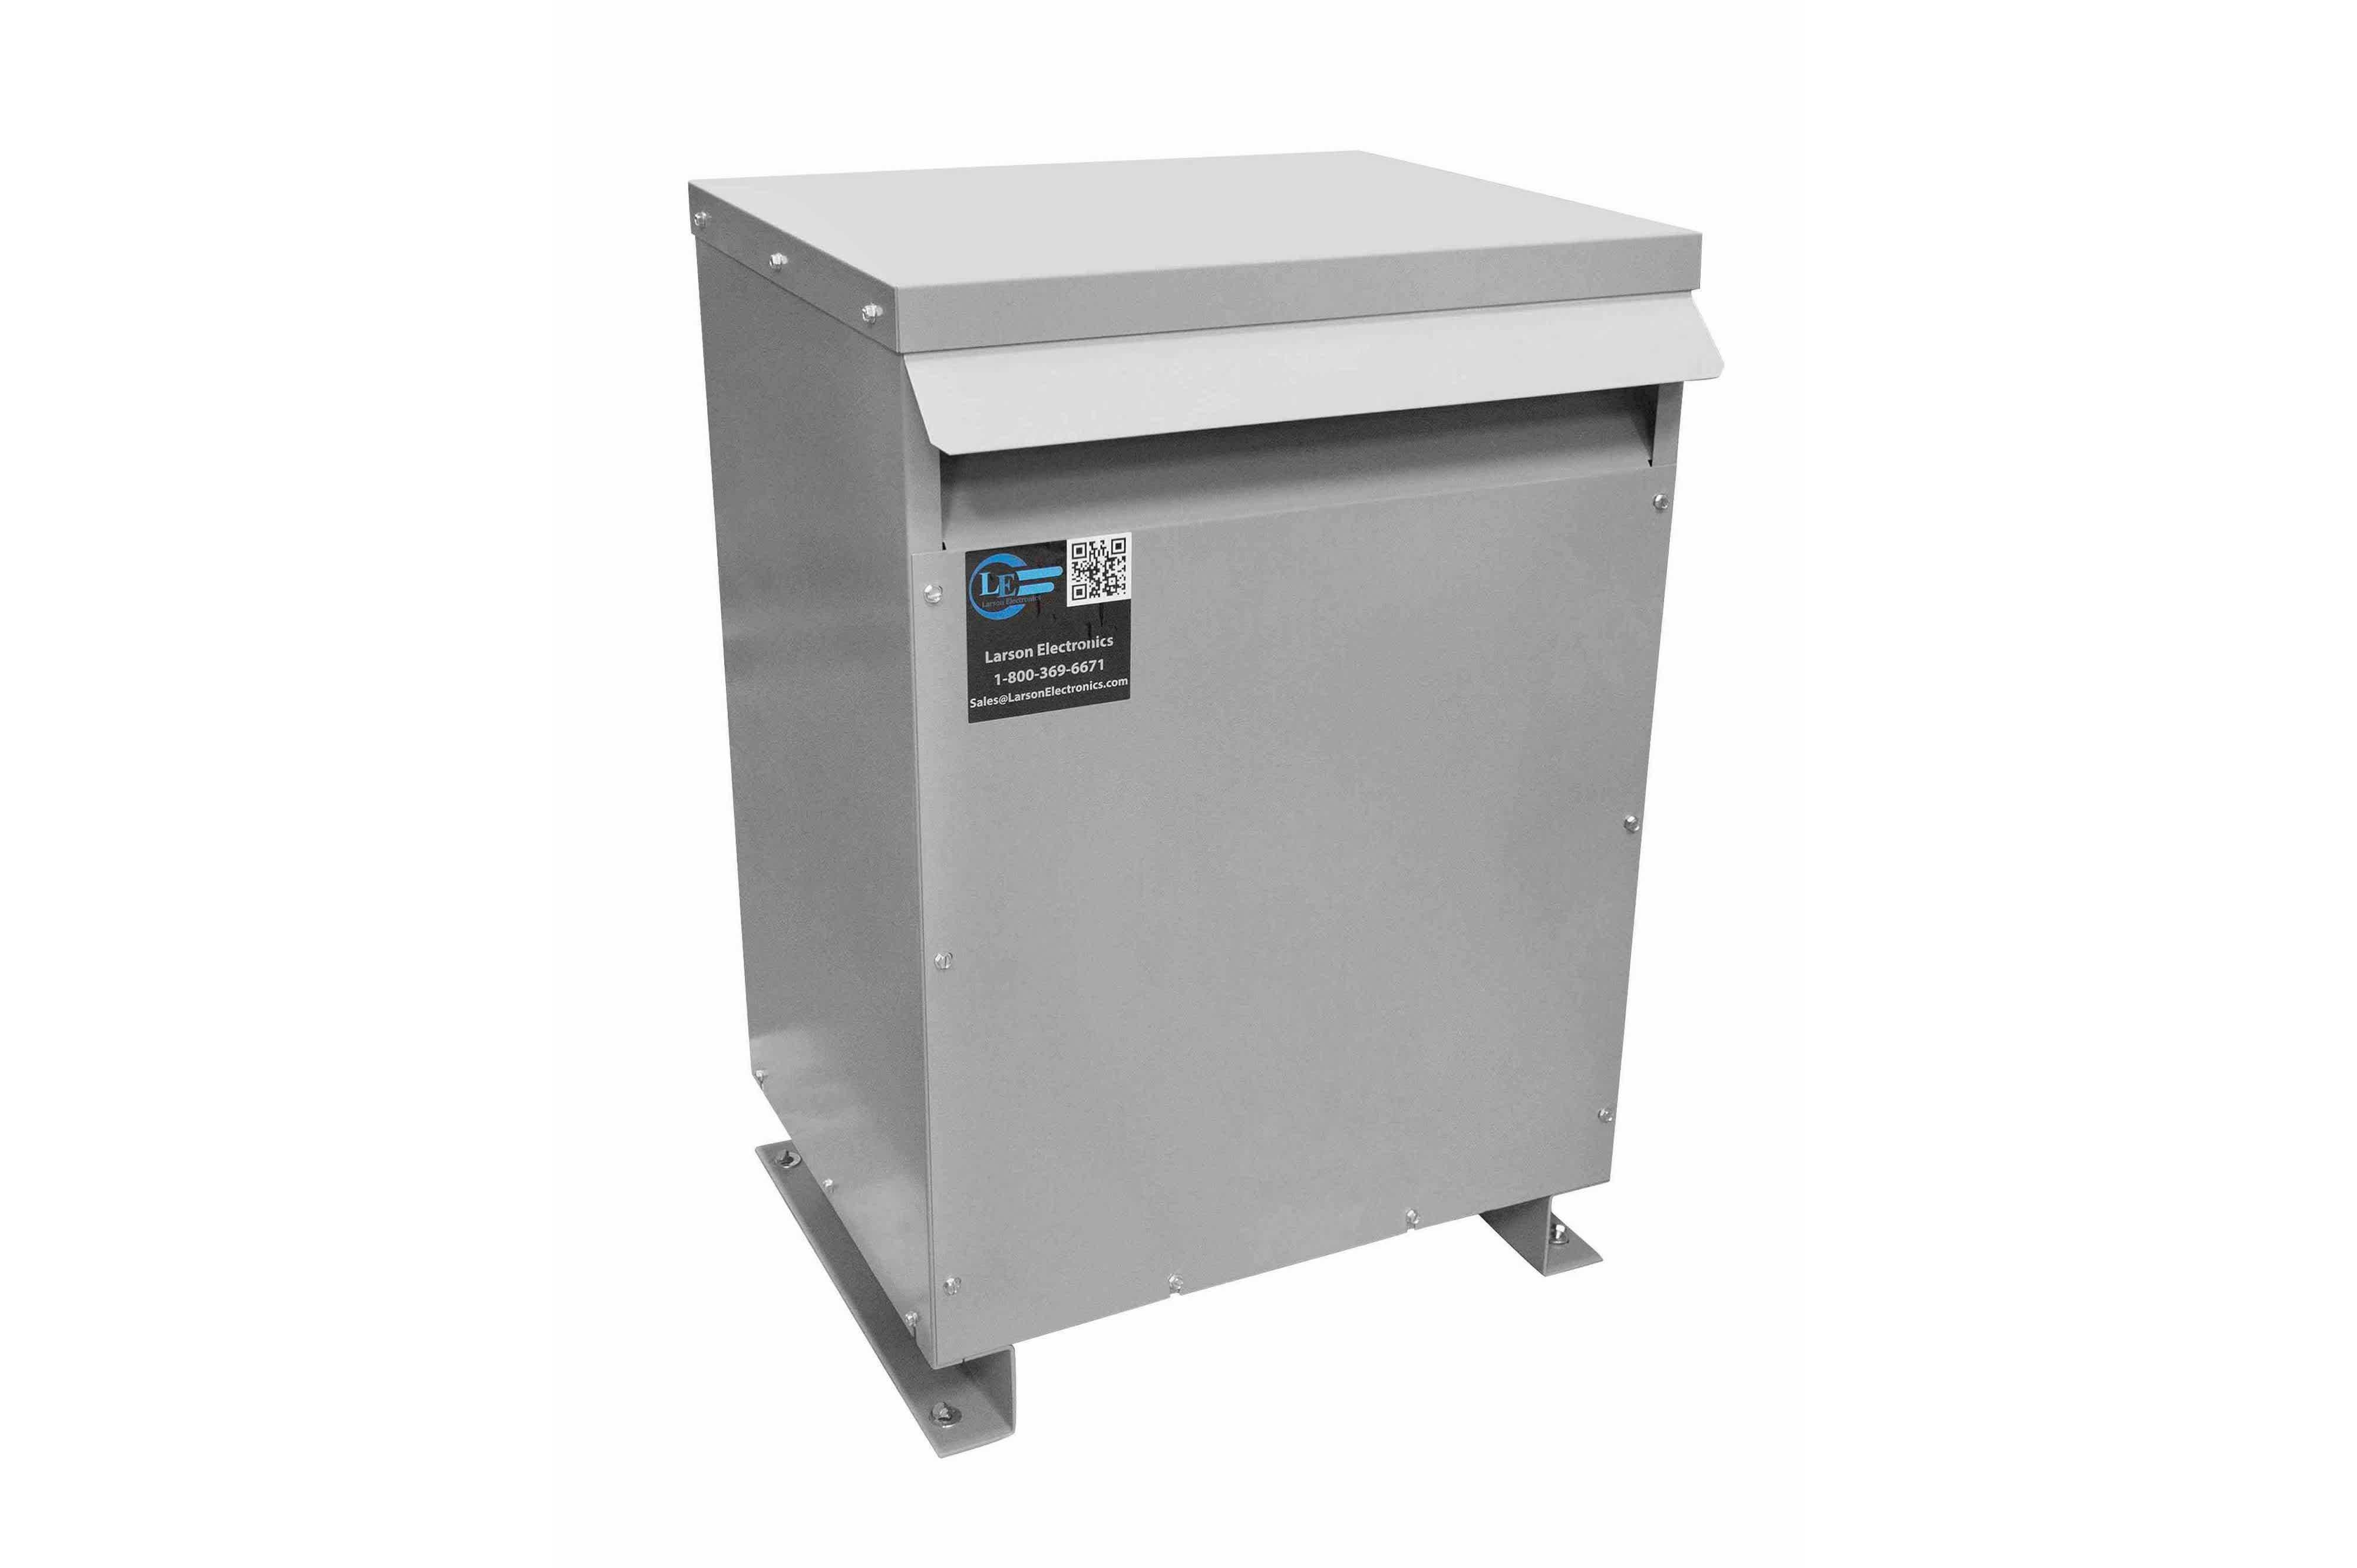 1000 kVA 3PH DOE Transformer, 600V Delta Primary, 208Y/120 Wye-N Secondary, N3R, Ventilated, 60 Hz